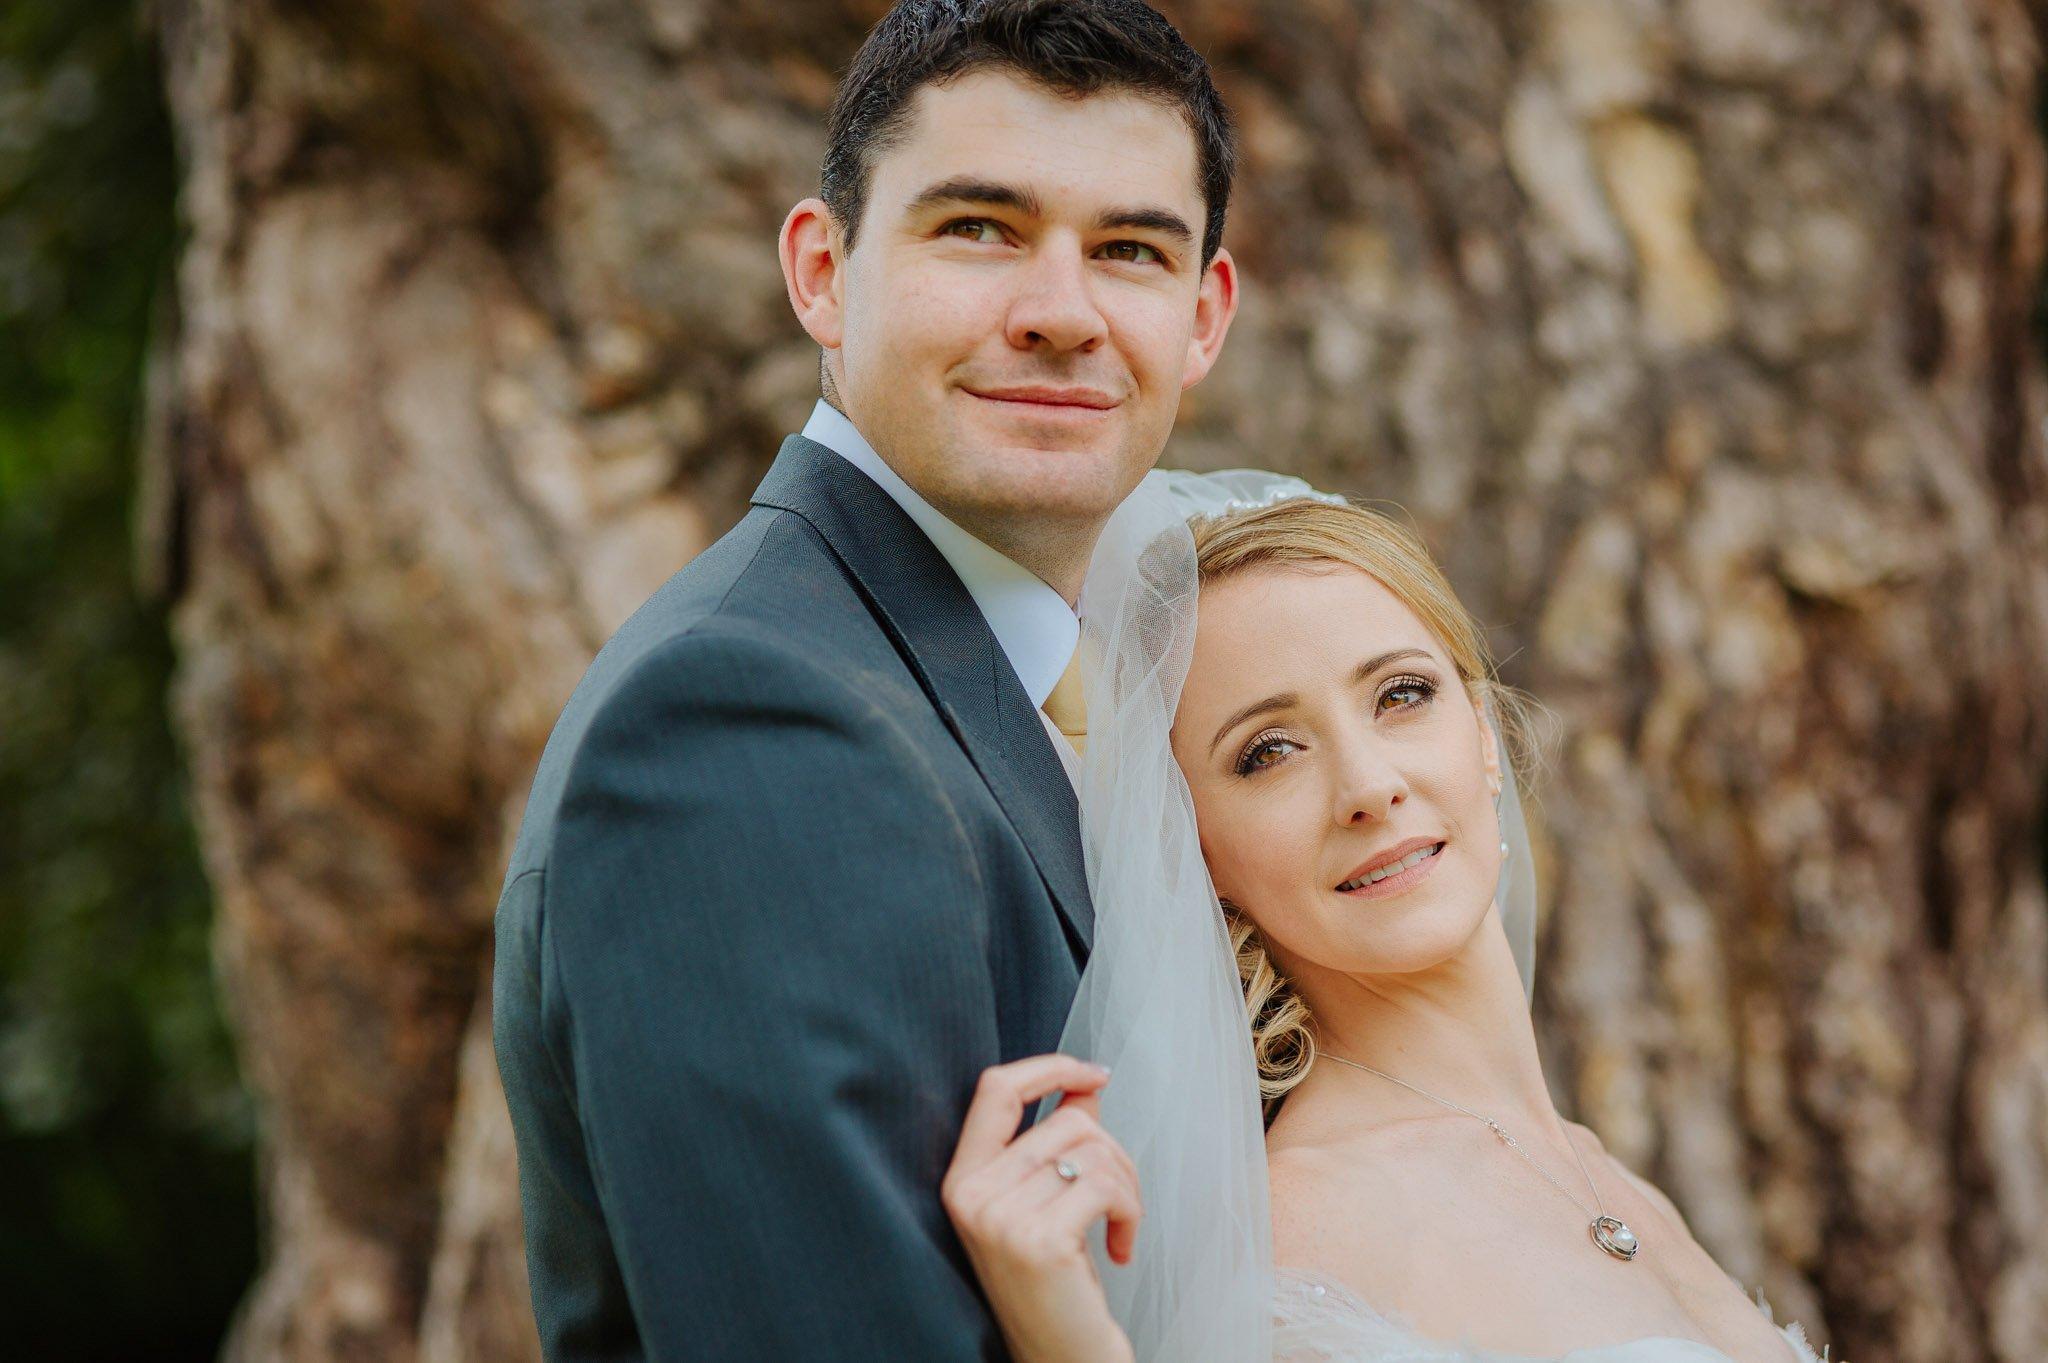 Georgina + Mike - Wedding photography in Malvern, Worcestershire 50